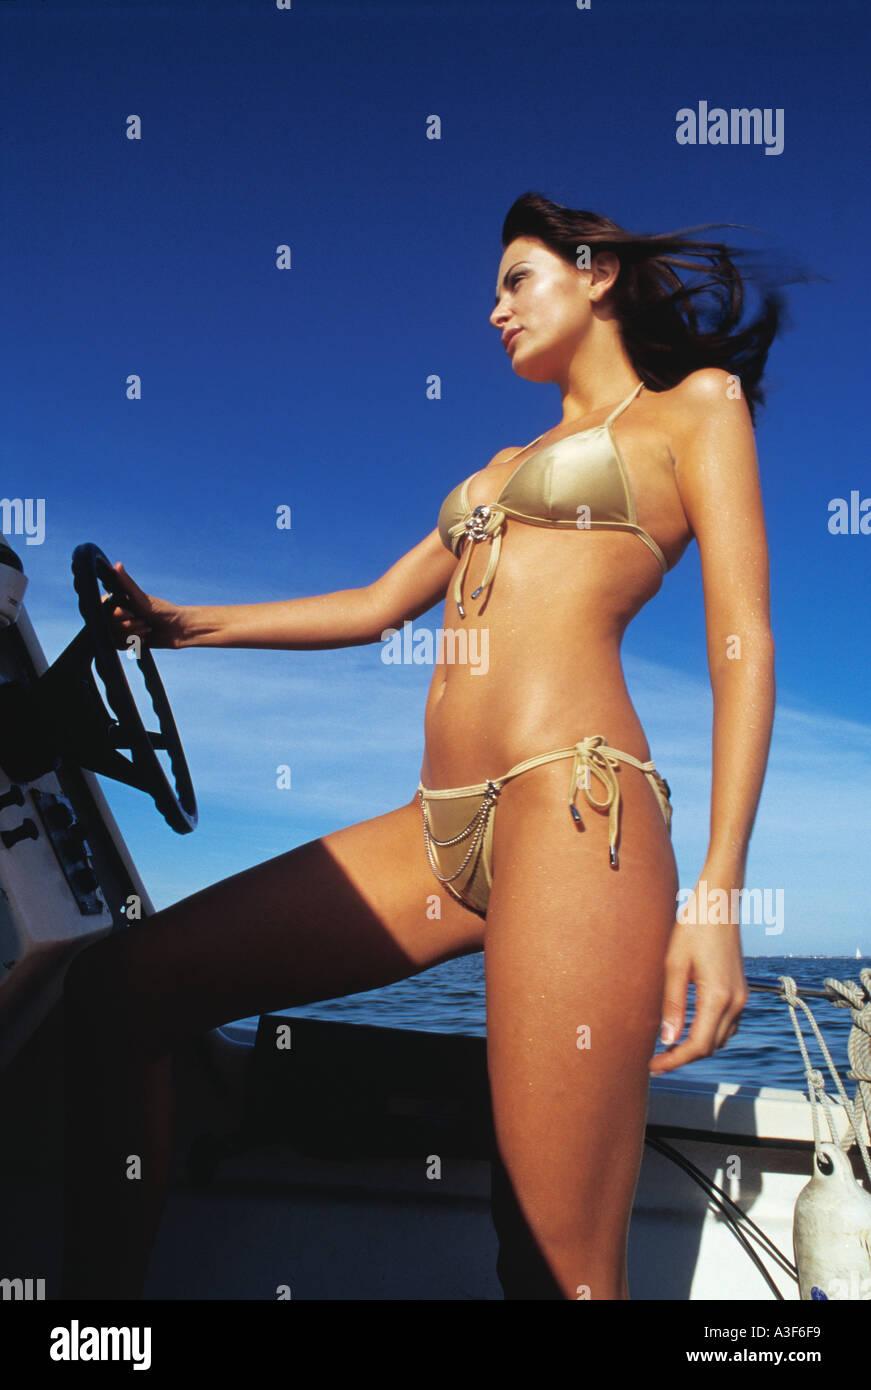 Boat bikini fishing